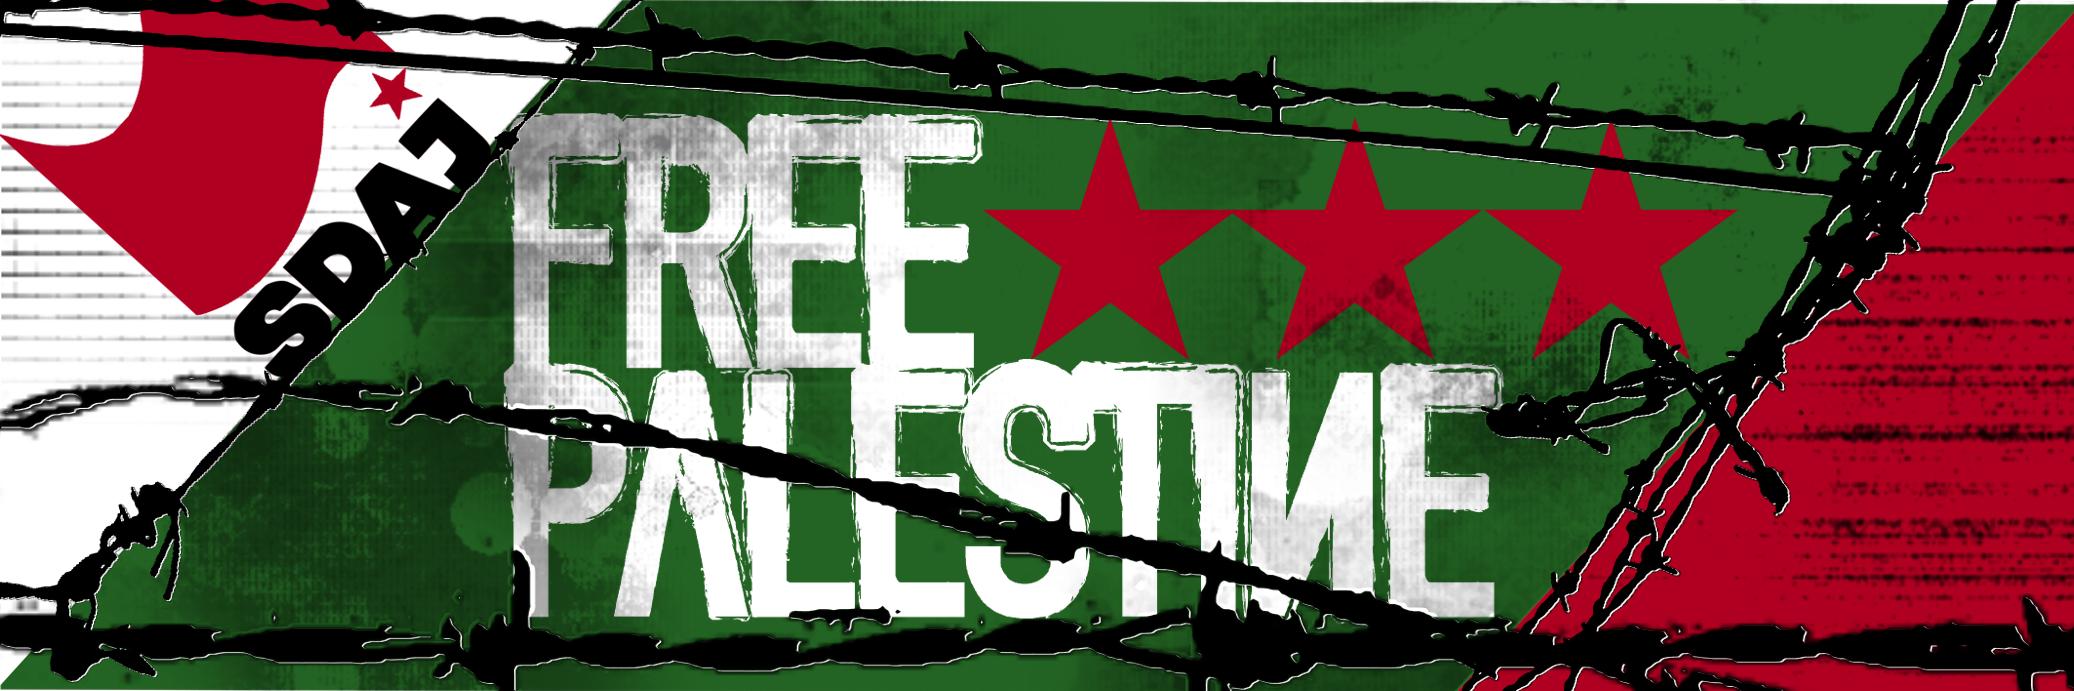 Sofortiger Stopp der Angriffe auf Gaza!